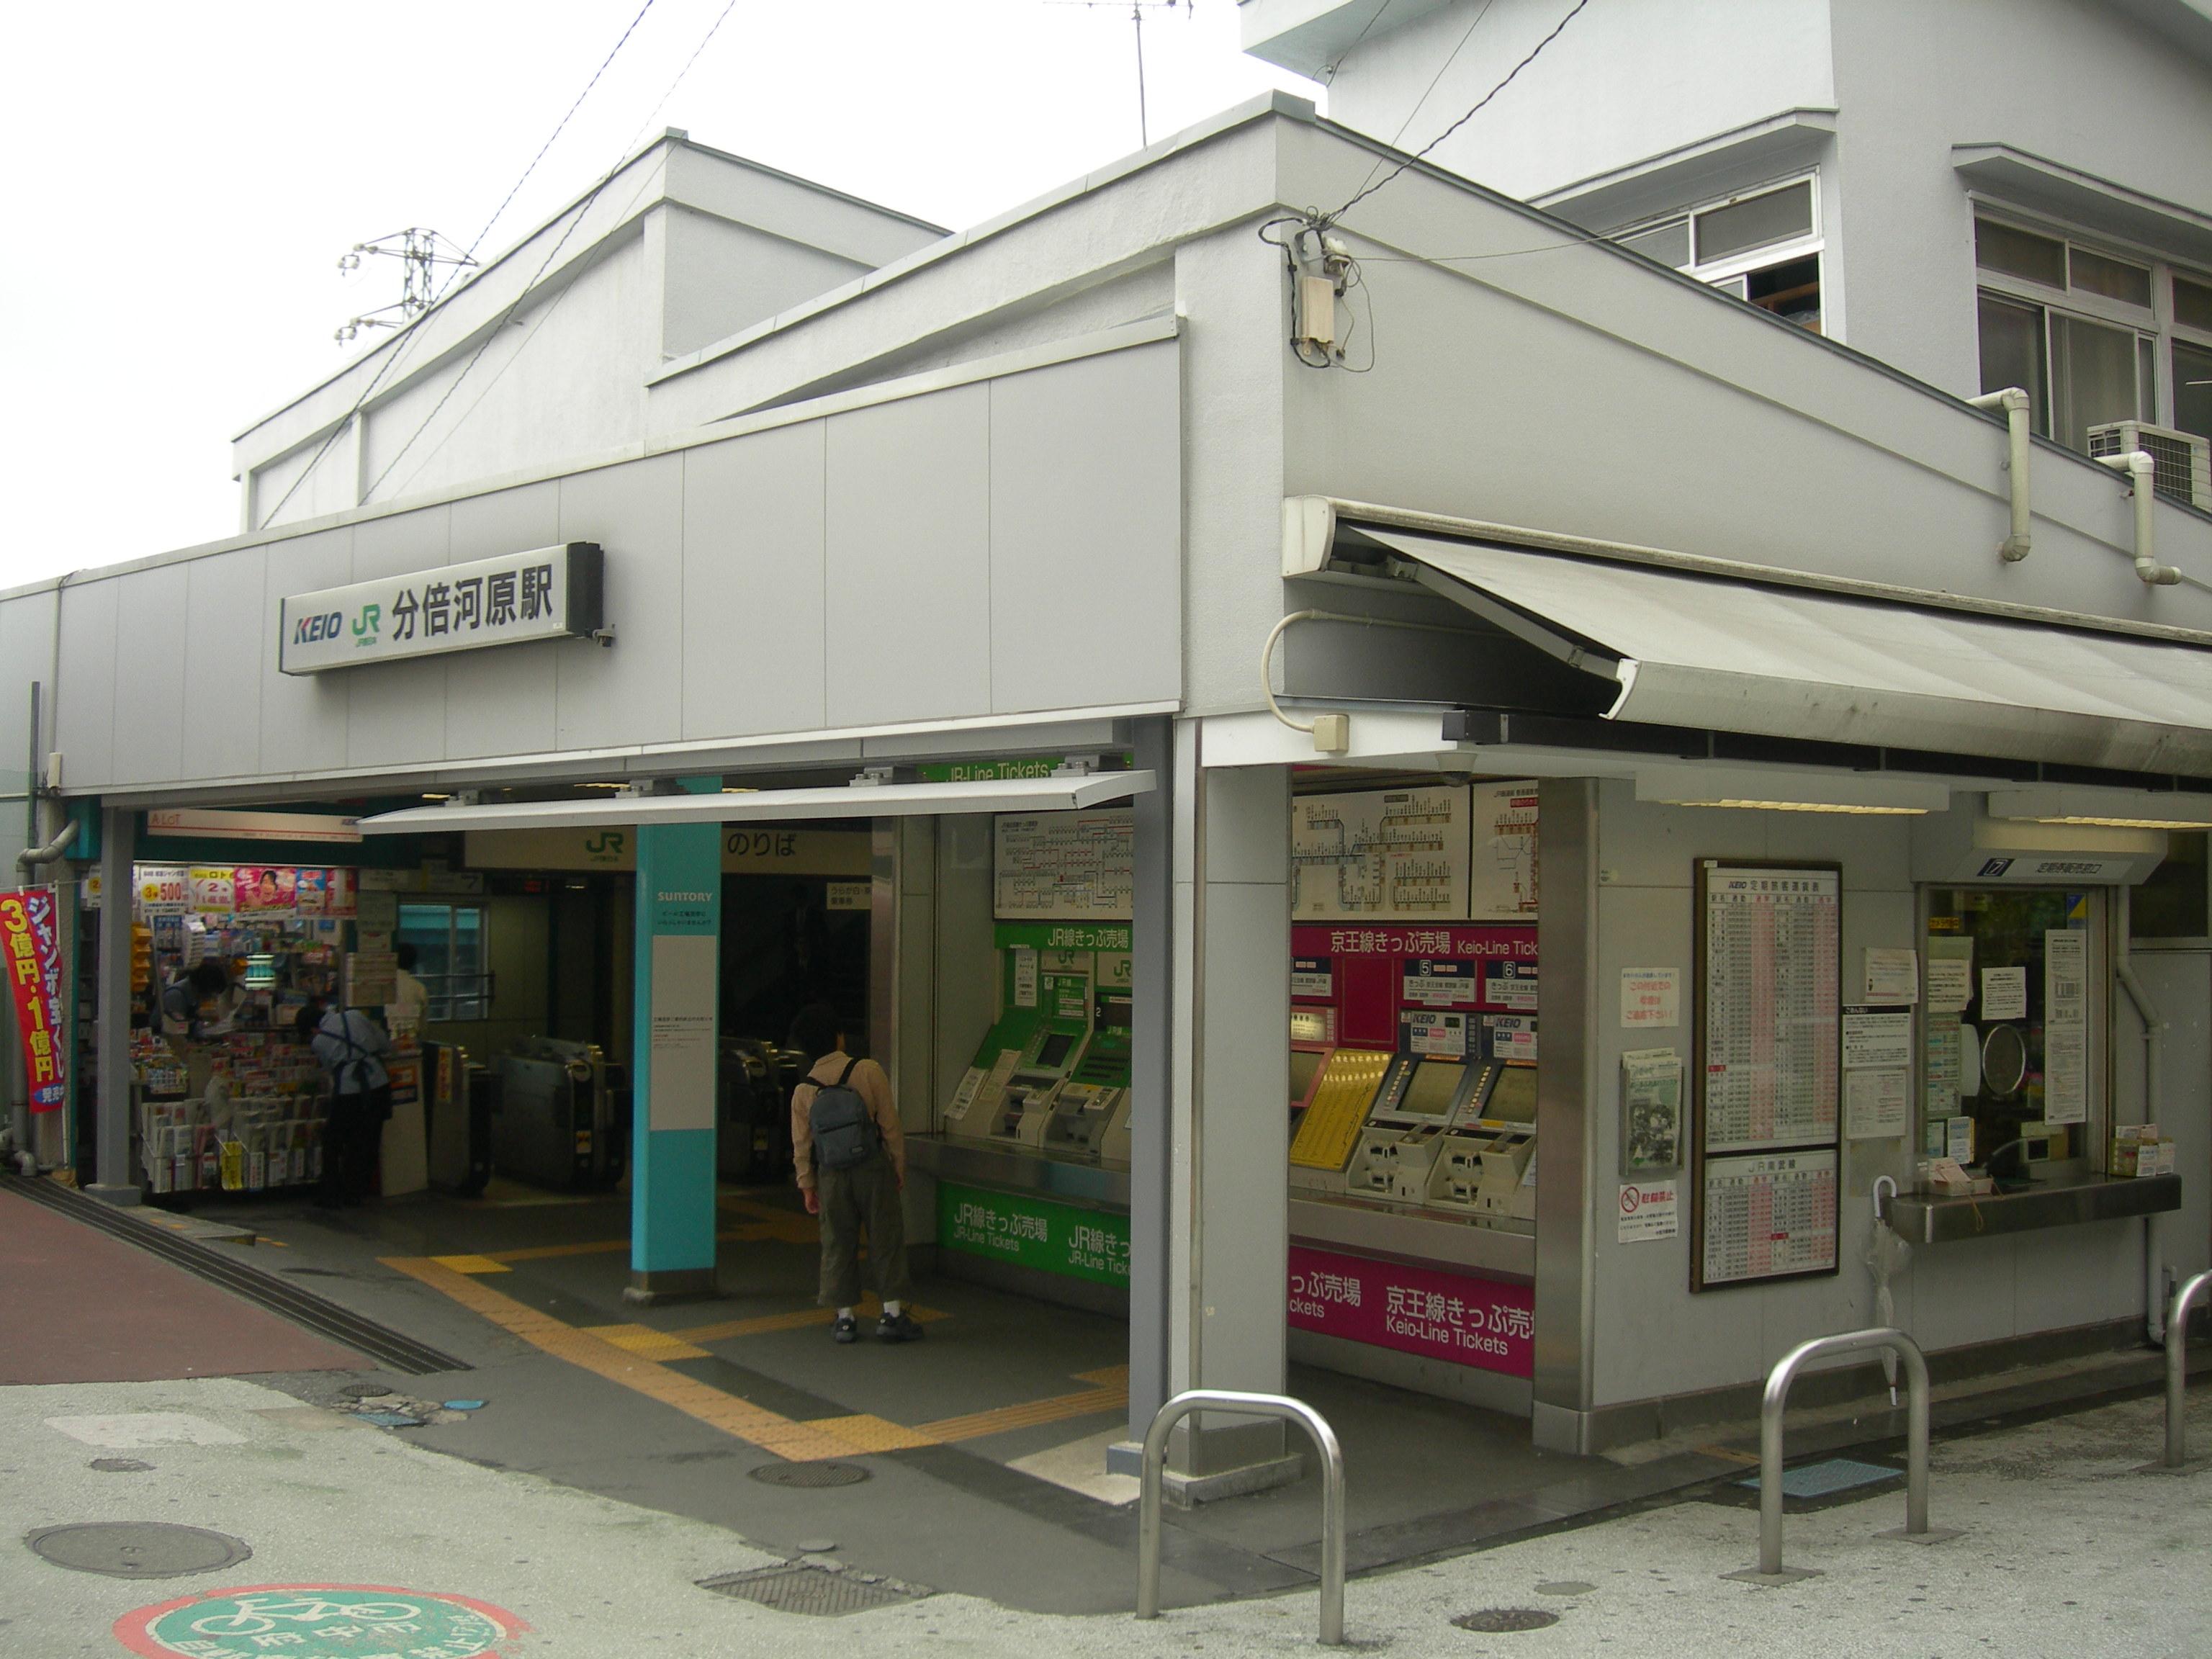 https://upload.wikimedia.org/wikipedia/commons/d/d6/BubaigawaraStation.JPG